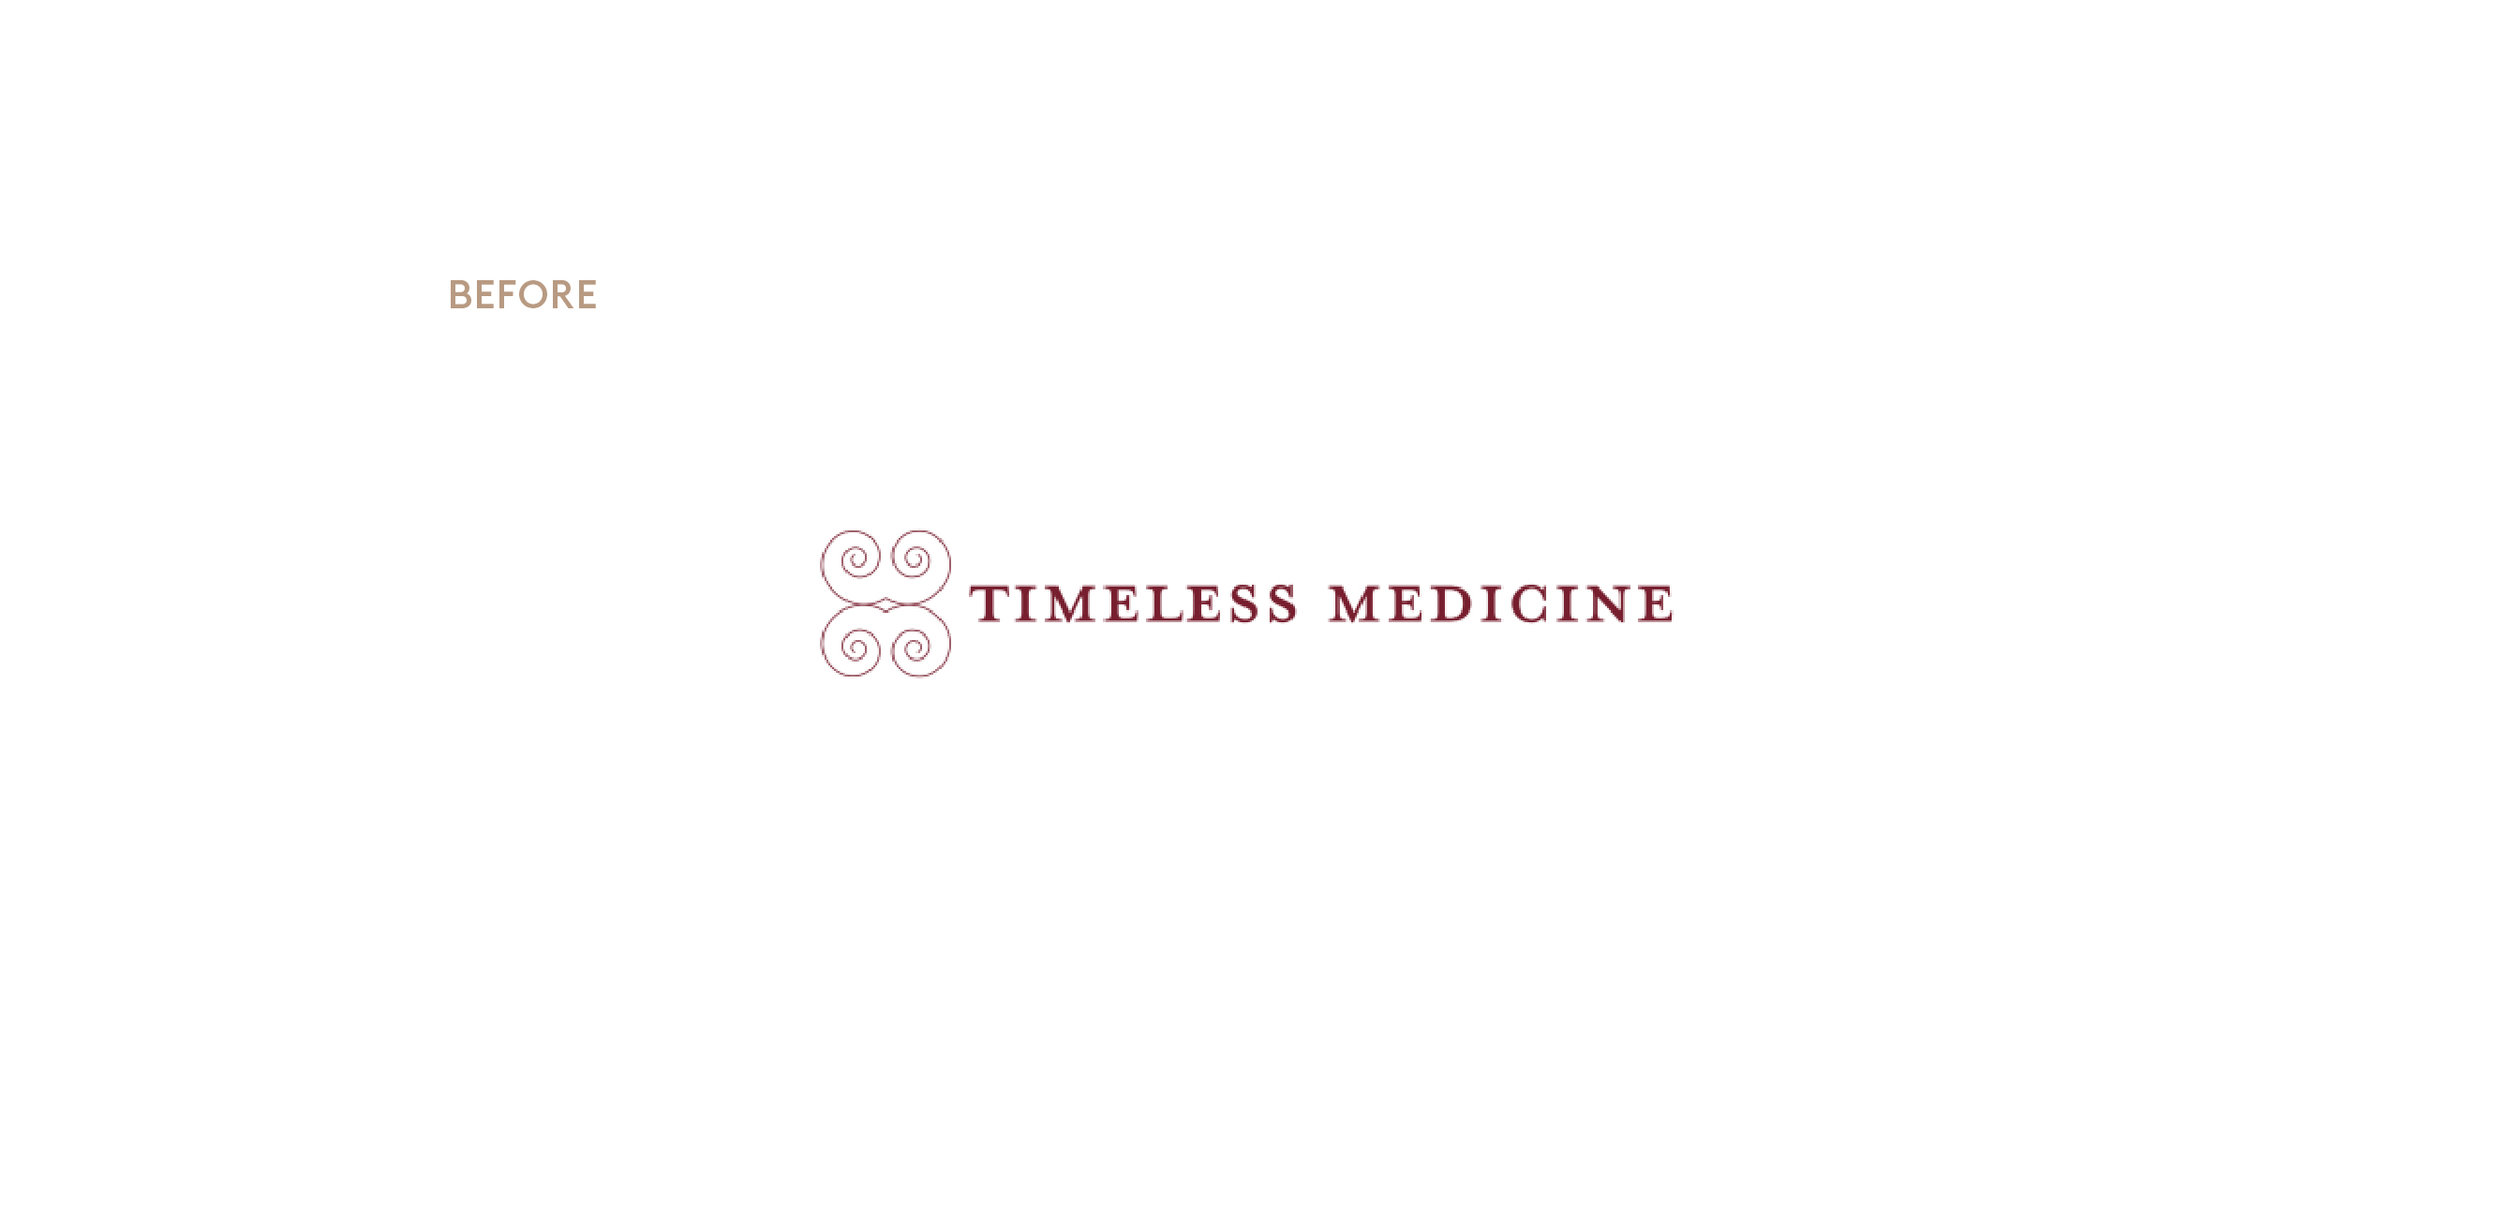 03_20181129_Penny_Lorber_TimelessMedicine.jpg